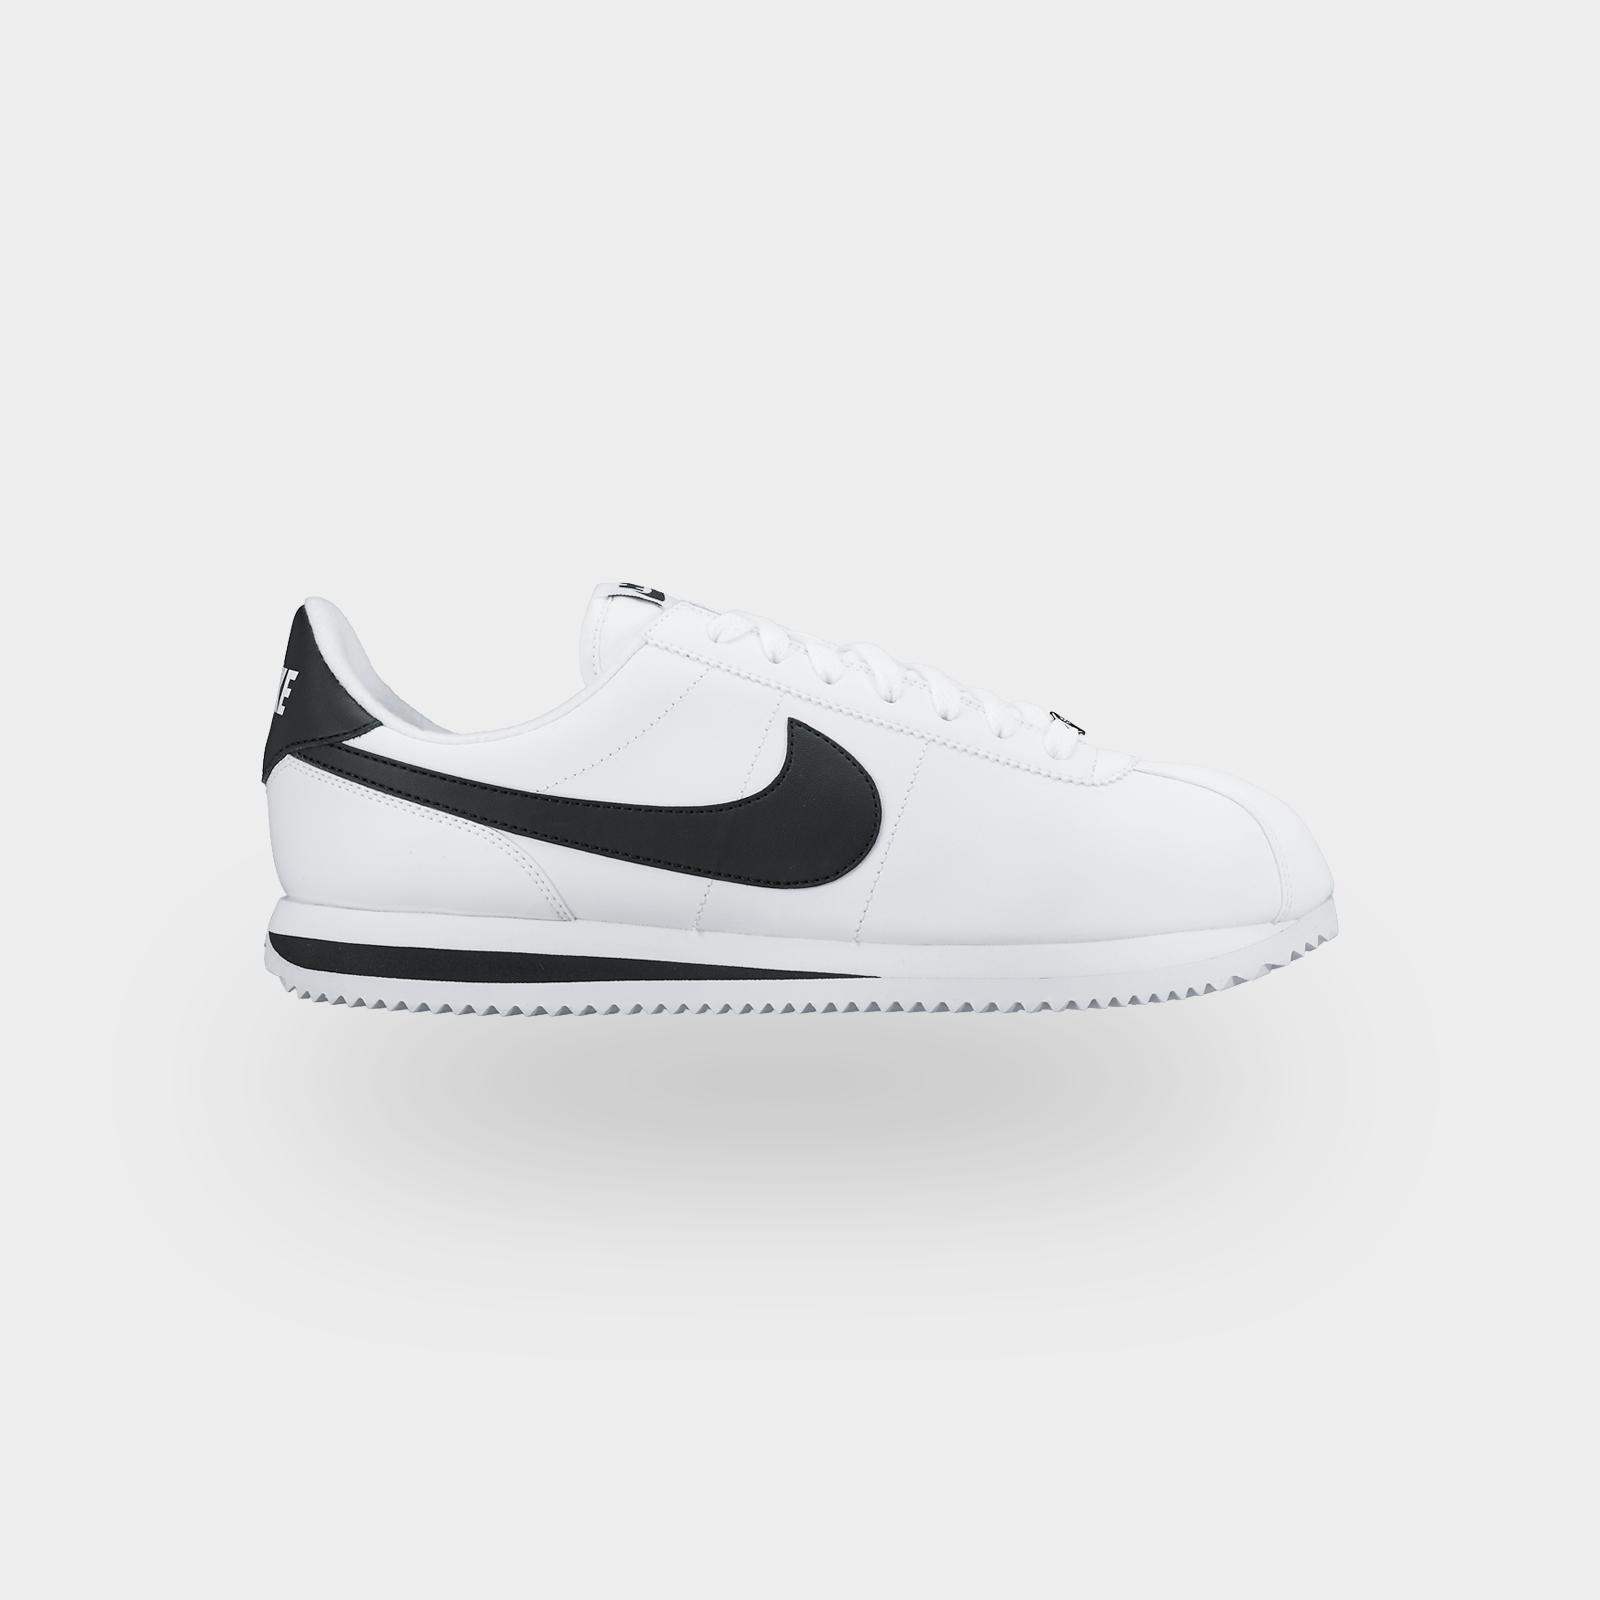 Curiosidad Cañón Naturaleza  Nike Cortez Basic Leather - 819719-100 - Sneakersnstuff | sneakers &  streetwear online since 1999